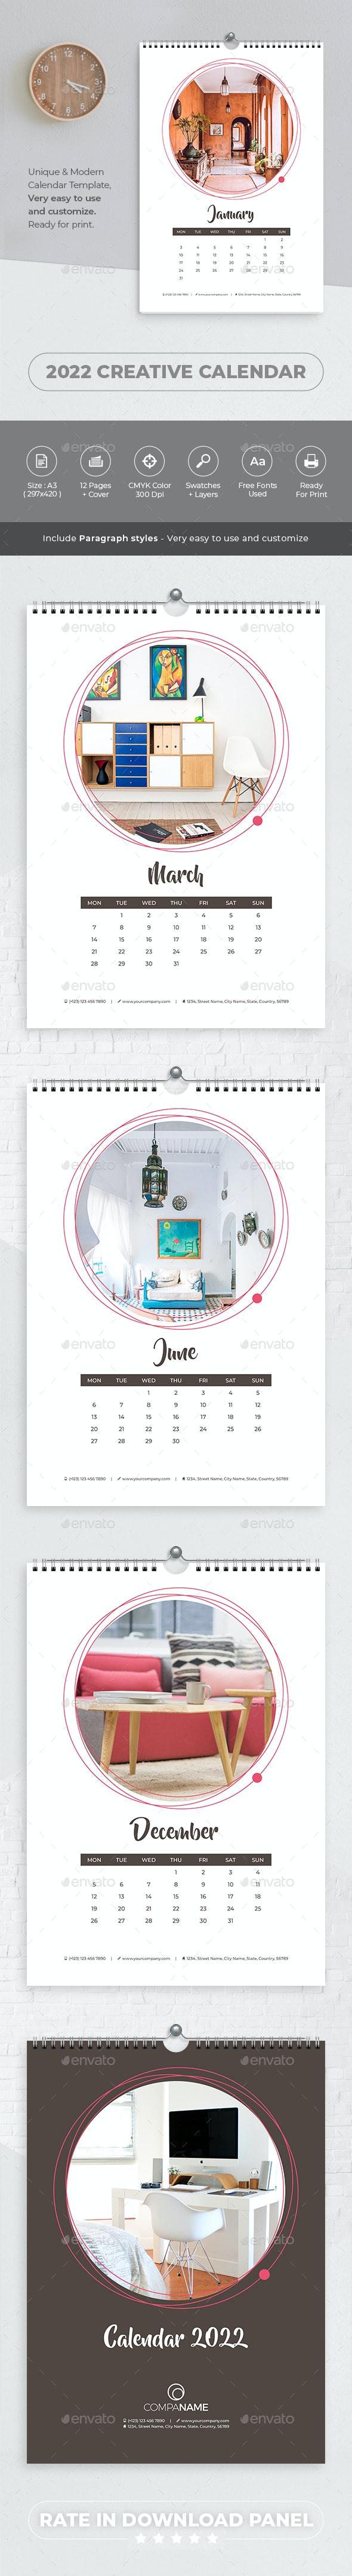 2022 Creative Calendar - Calendars Stationery